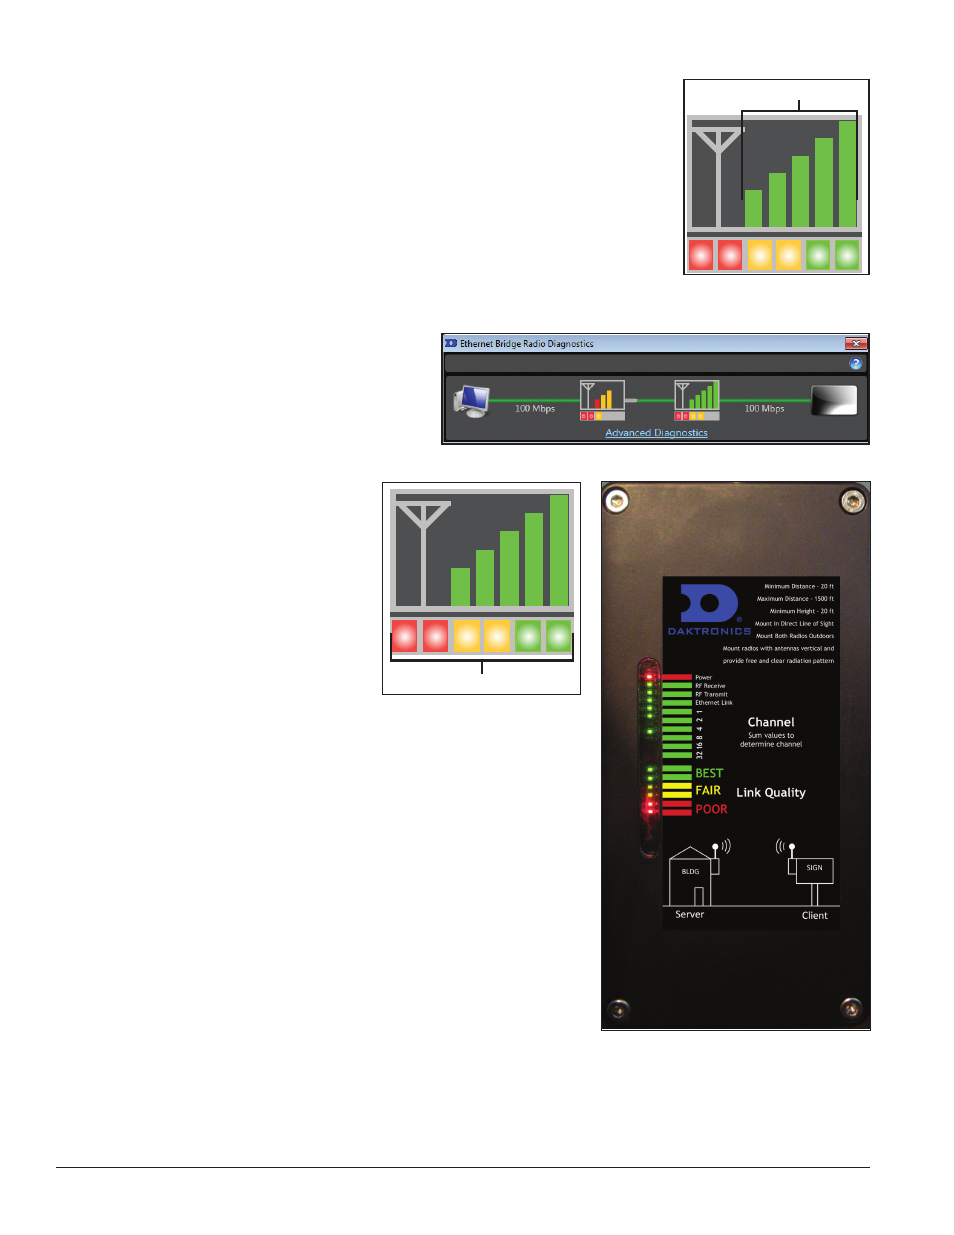 Daktronics Ethernet Bridge Radio EBR 900 MHz 0A 1327 1111 And